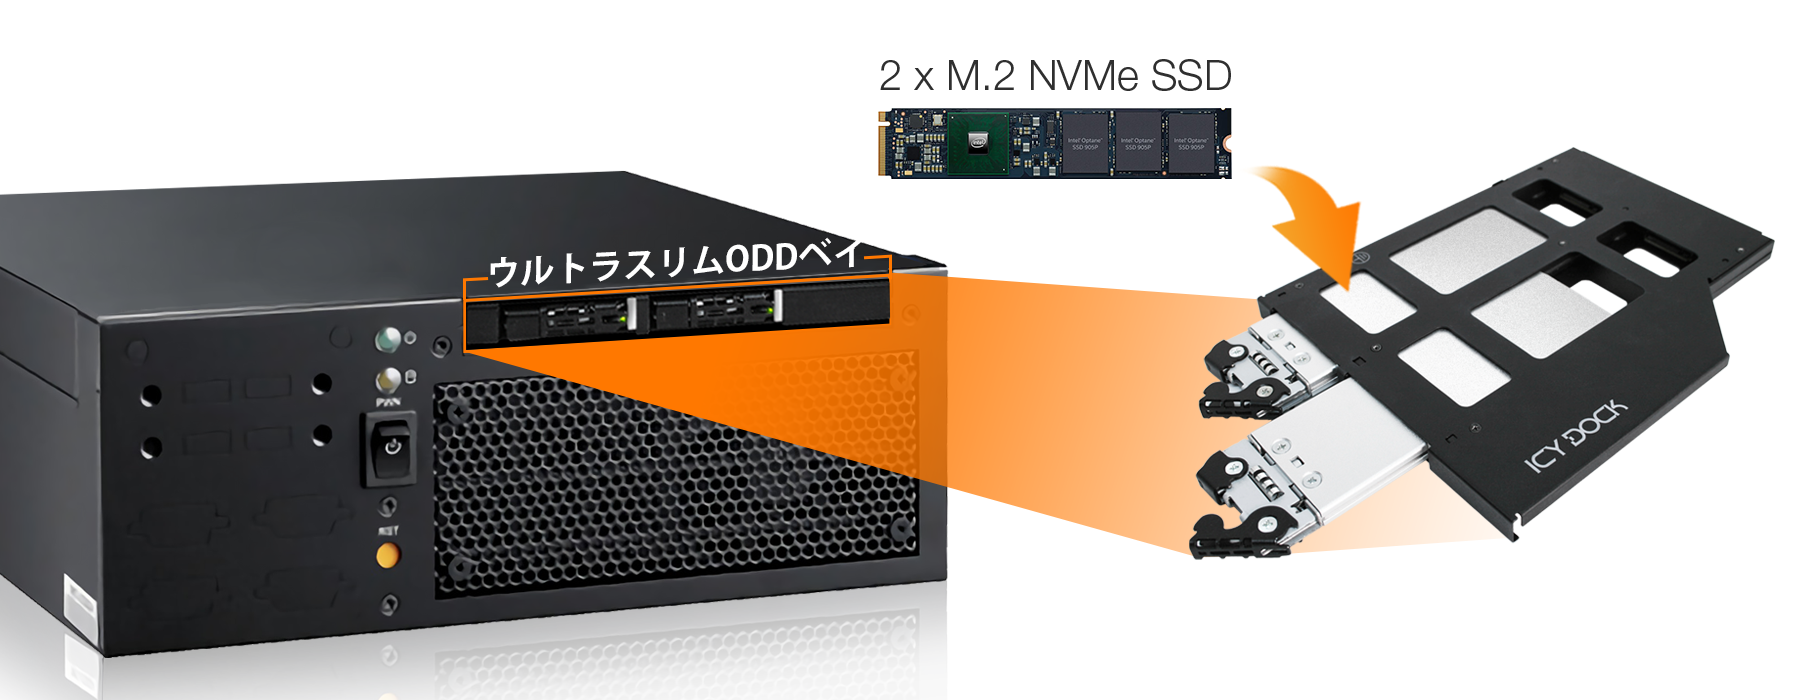 mb852m2po-b 世界初の取り外し可能なM.2 NVMe SSDエンクロージャ